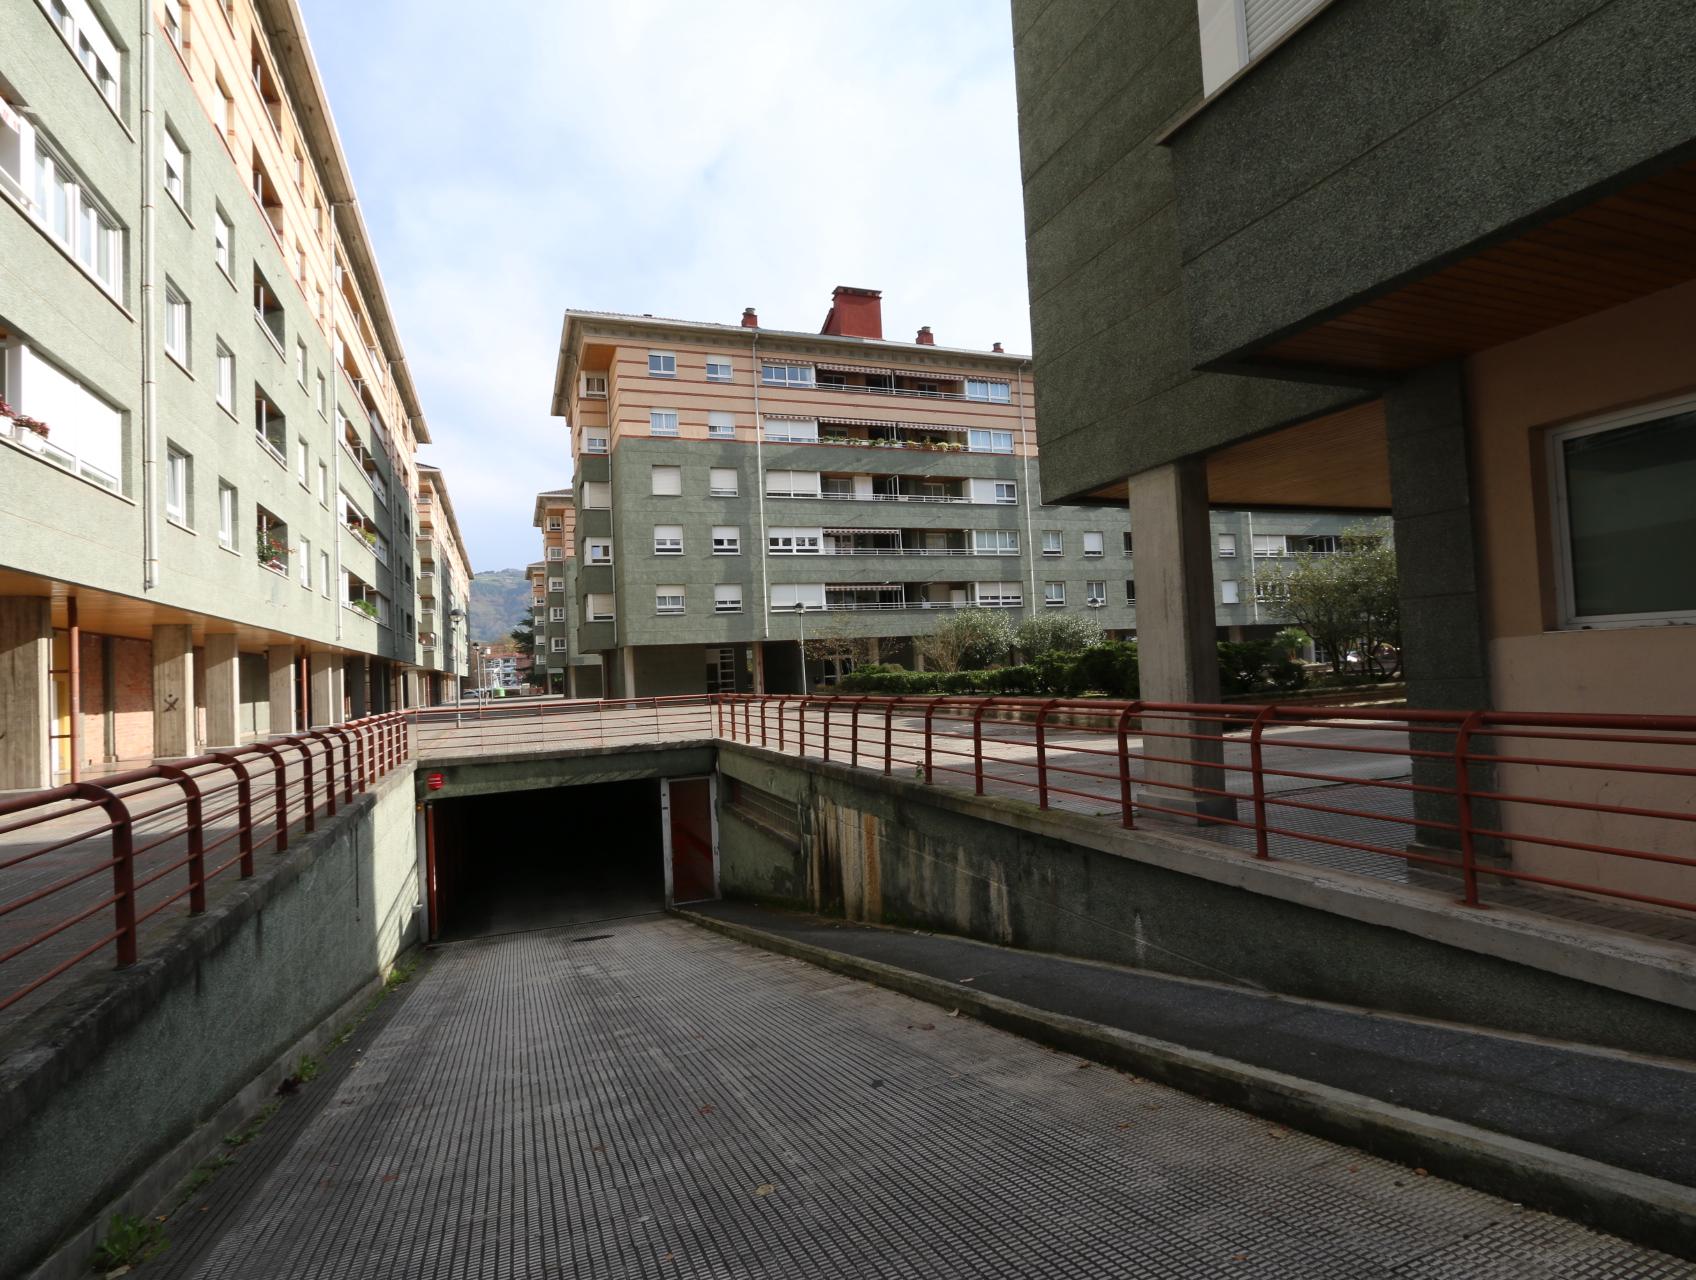 Garaje cerrado en venta en Iurre, Tolosa, Tolosaldea, Gipuzkoa